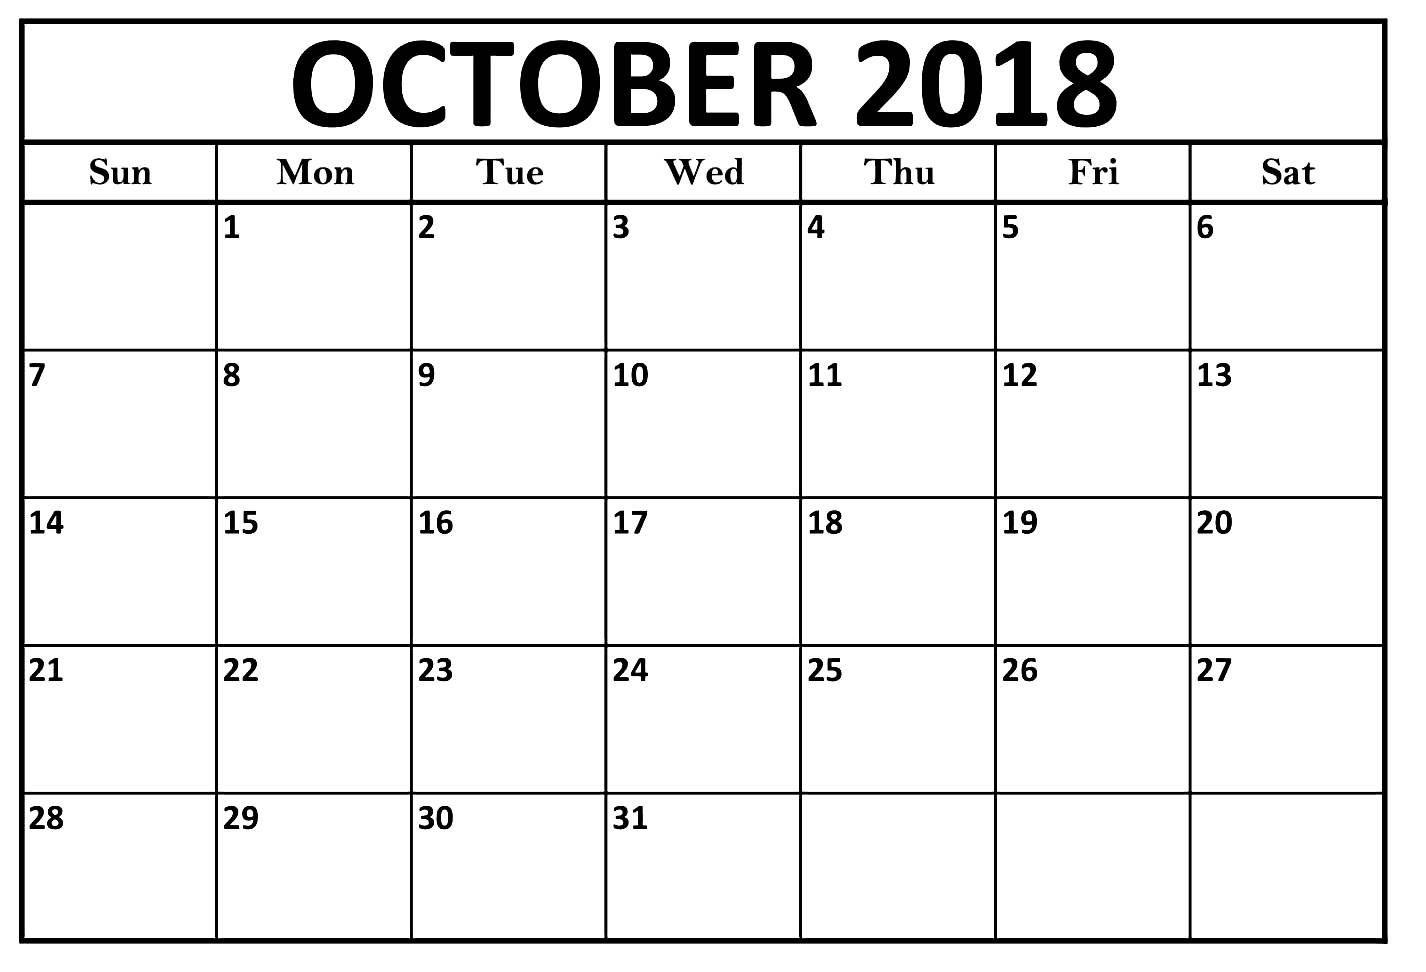 October Calendar 2018 Large Print Template | Calendar